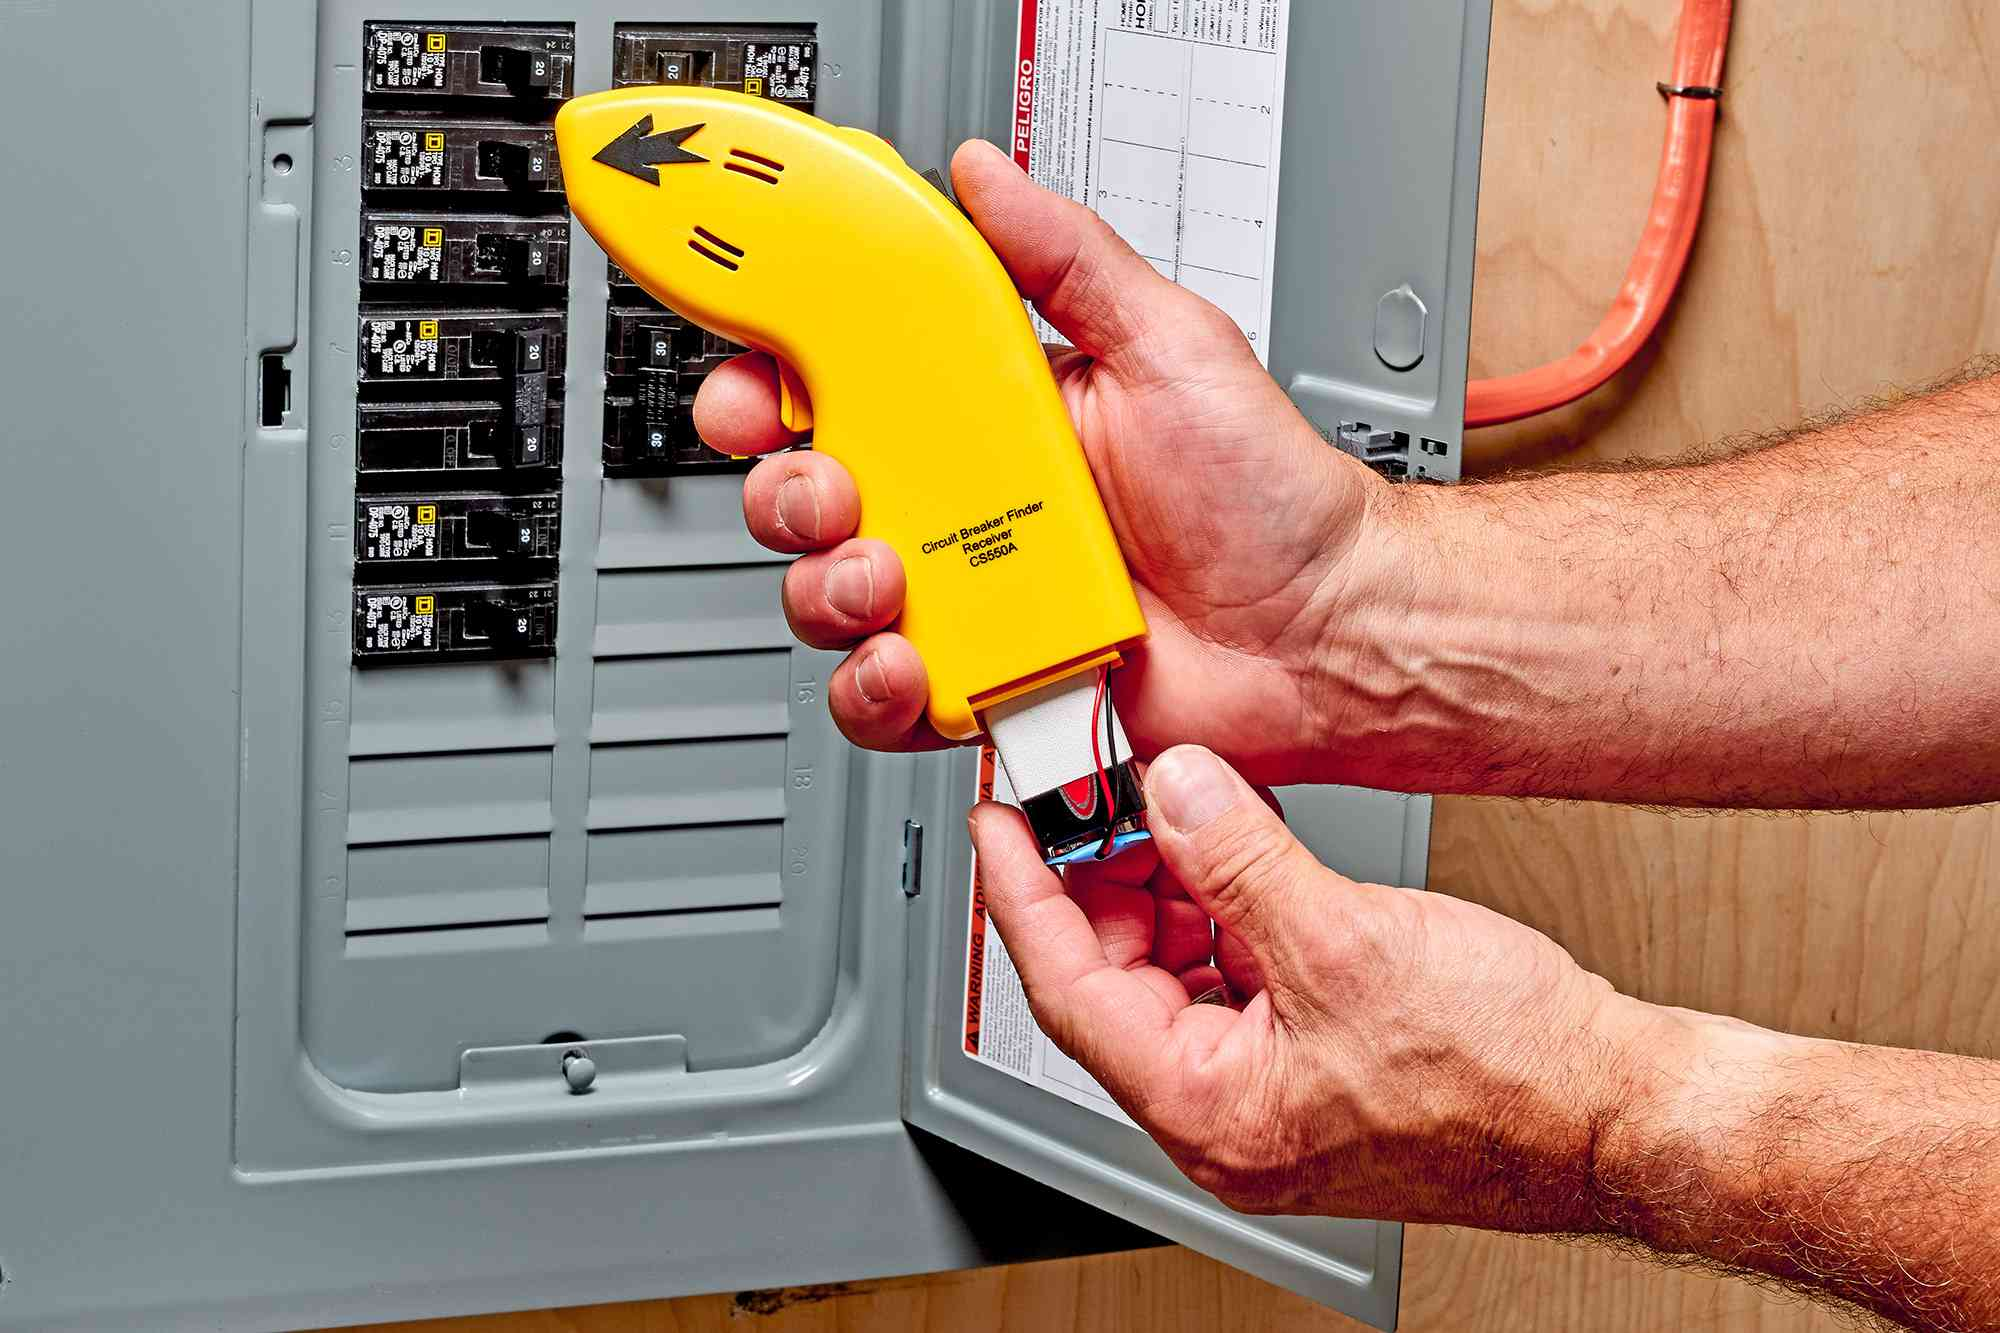 9-volt receiver battery installed in circuit breaker handle